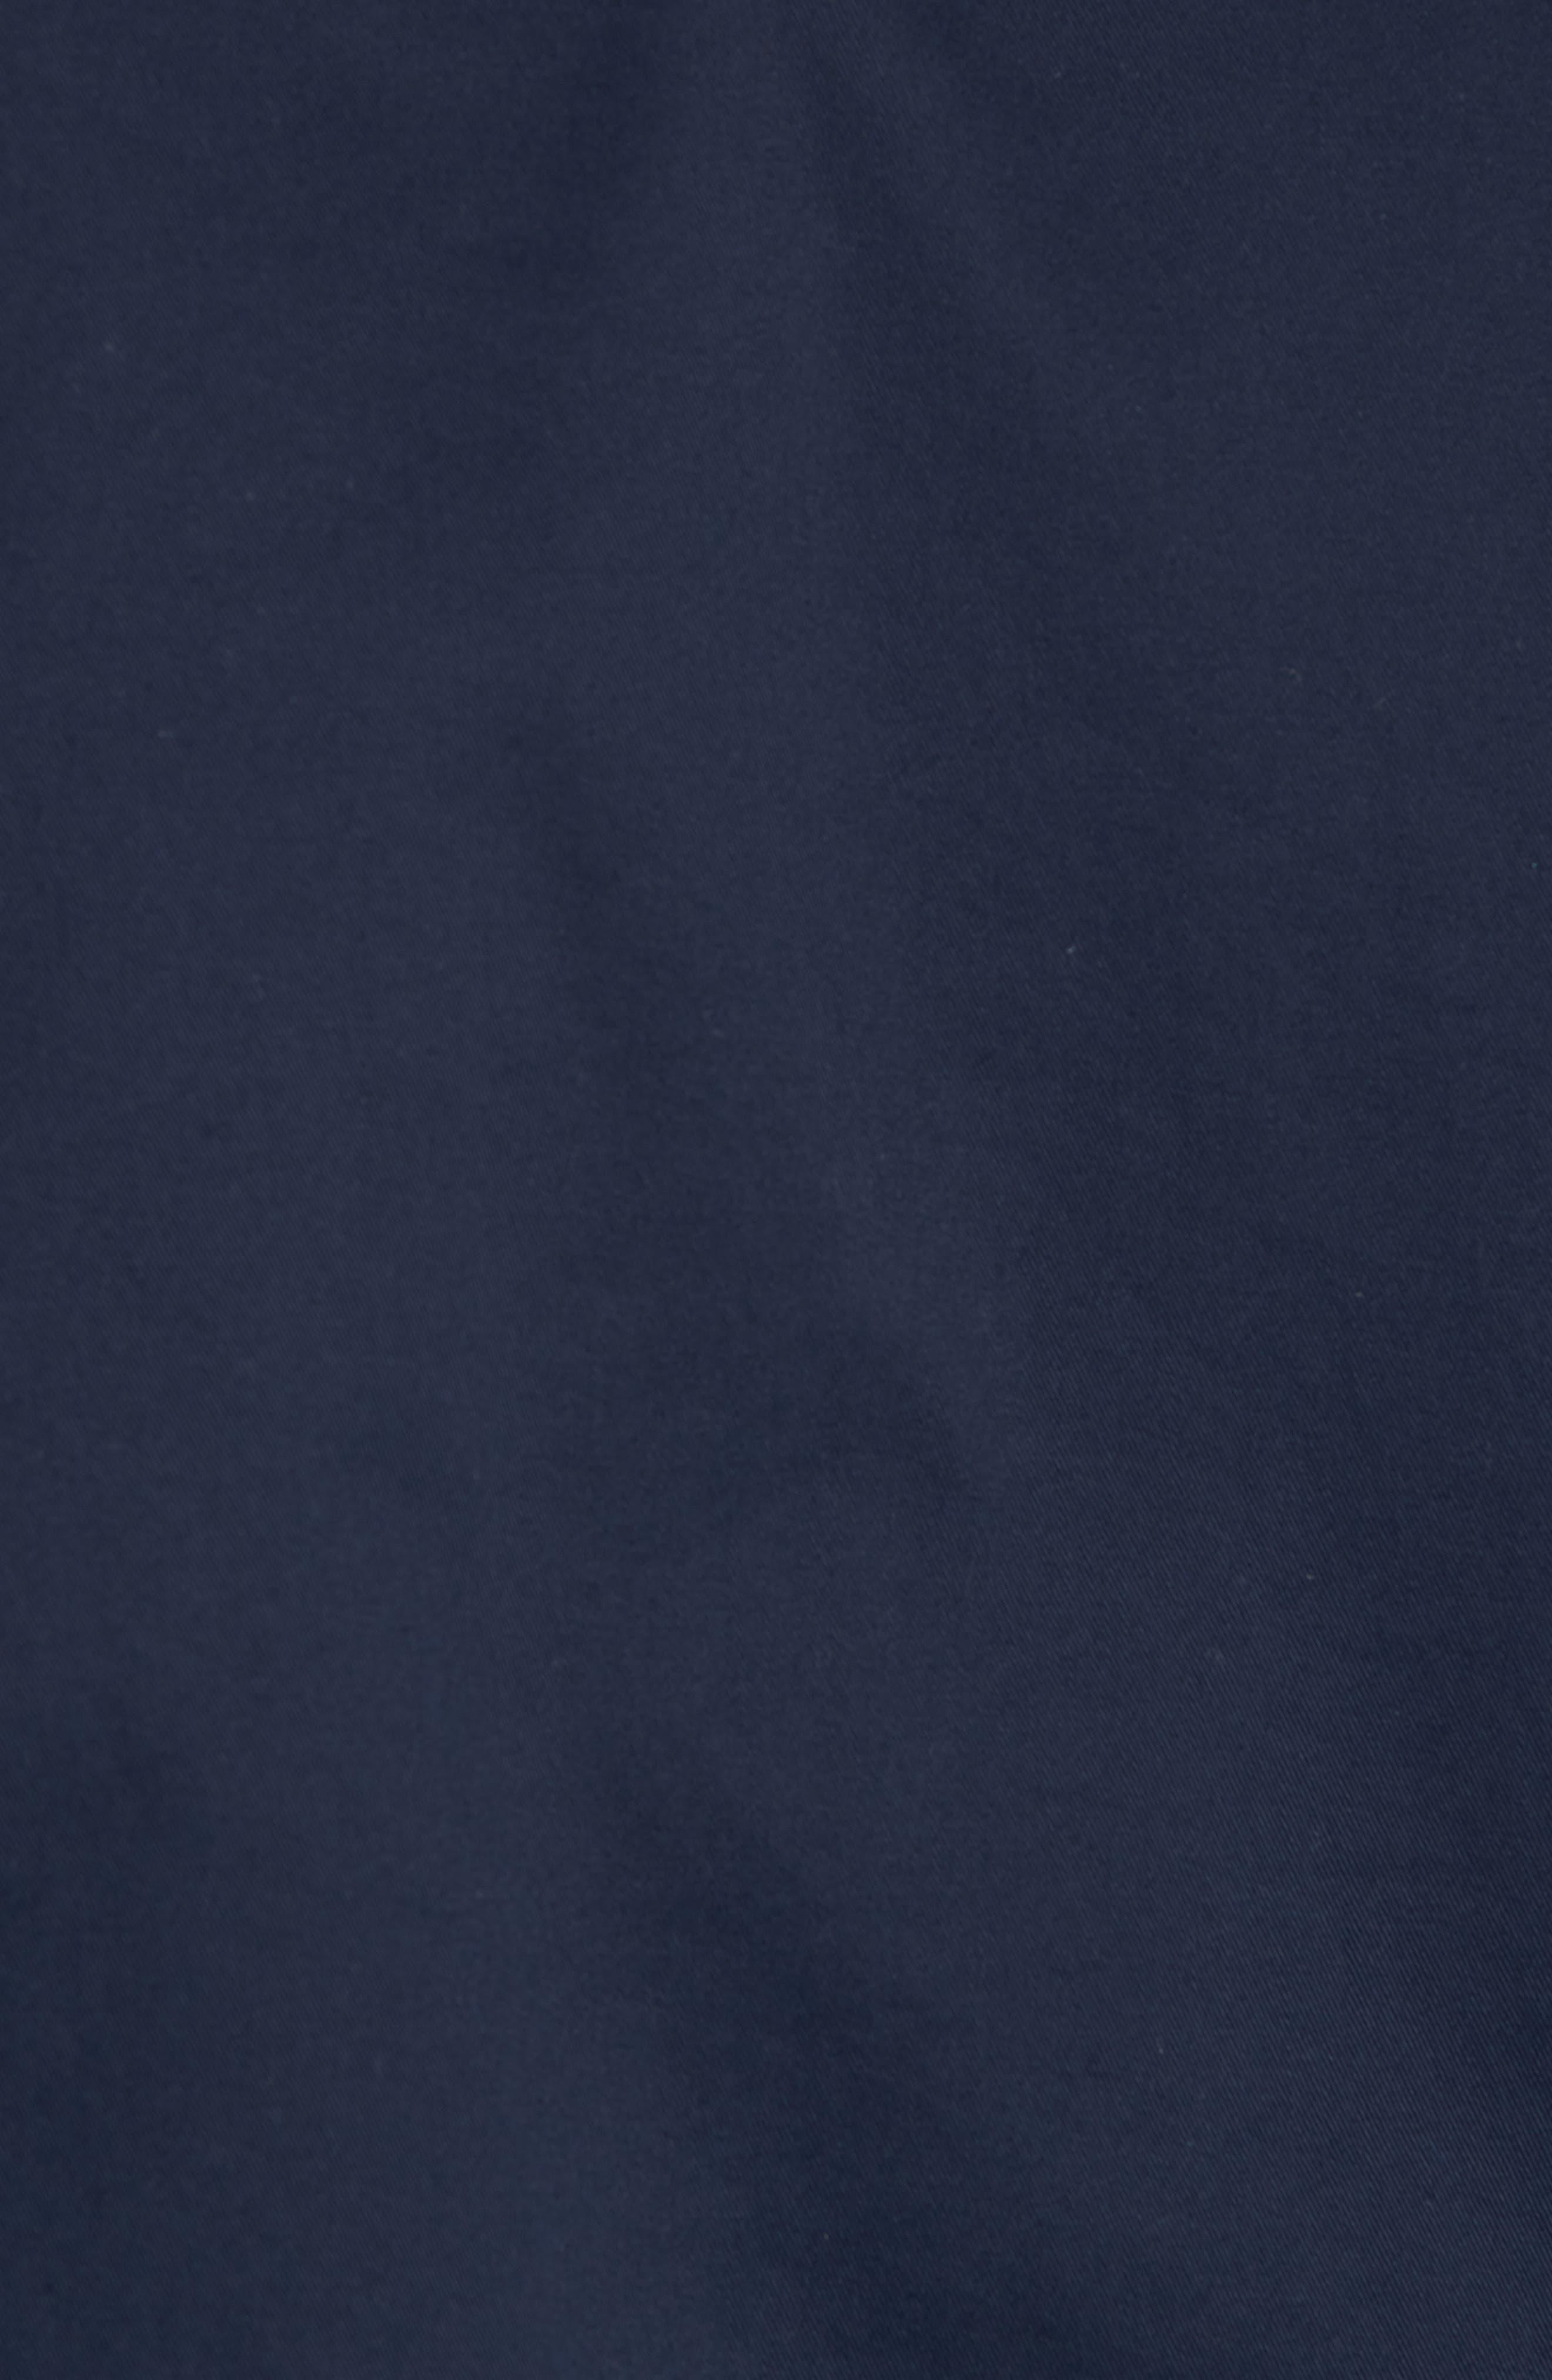 Reversible Bomber Jacket,                             Alternate thumbnail 6, color,                             Navy Iris